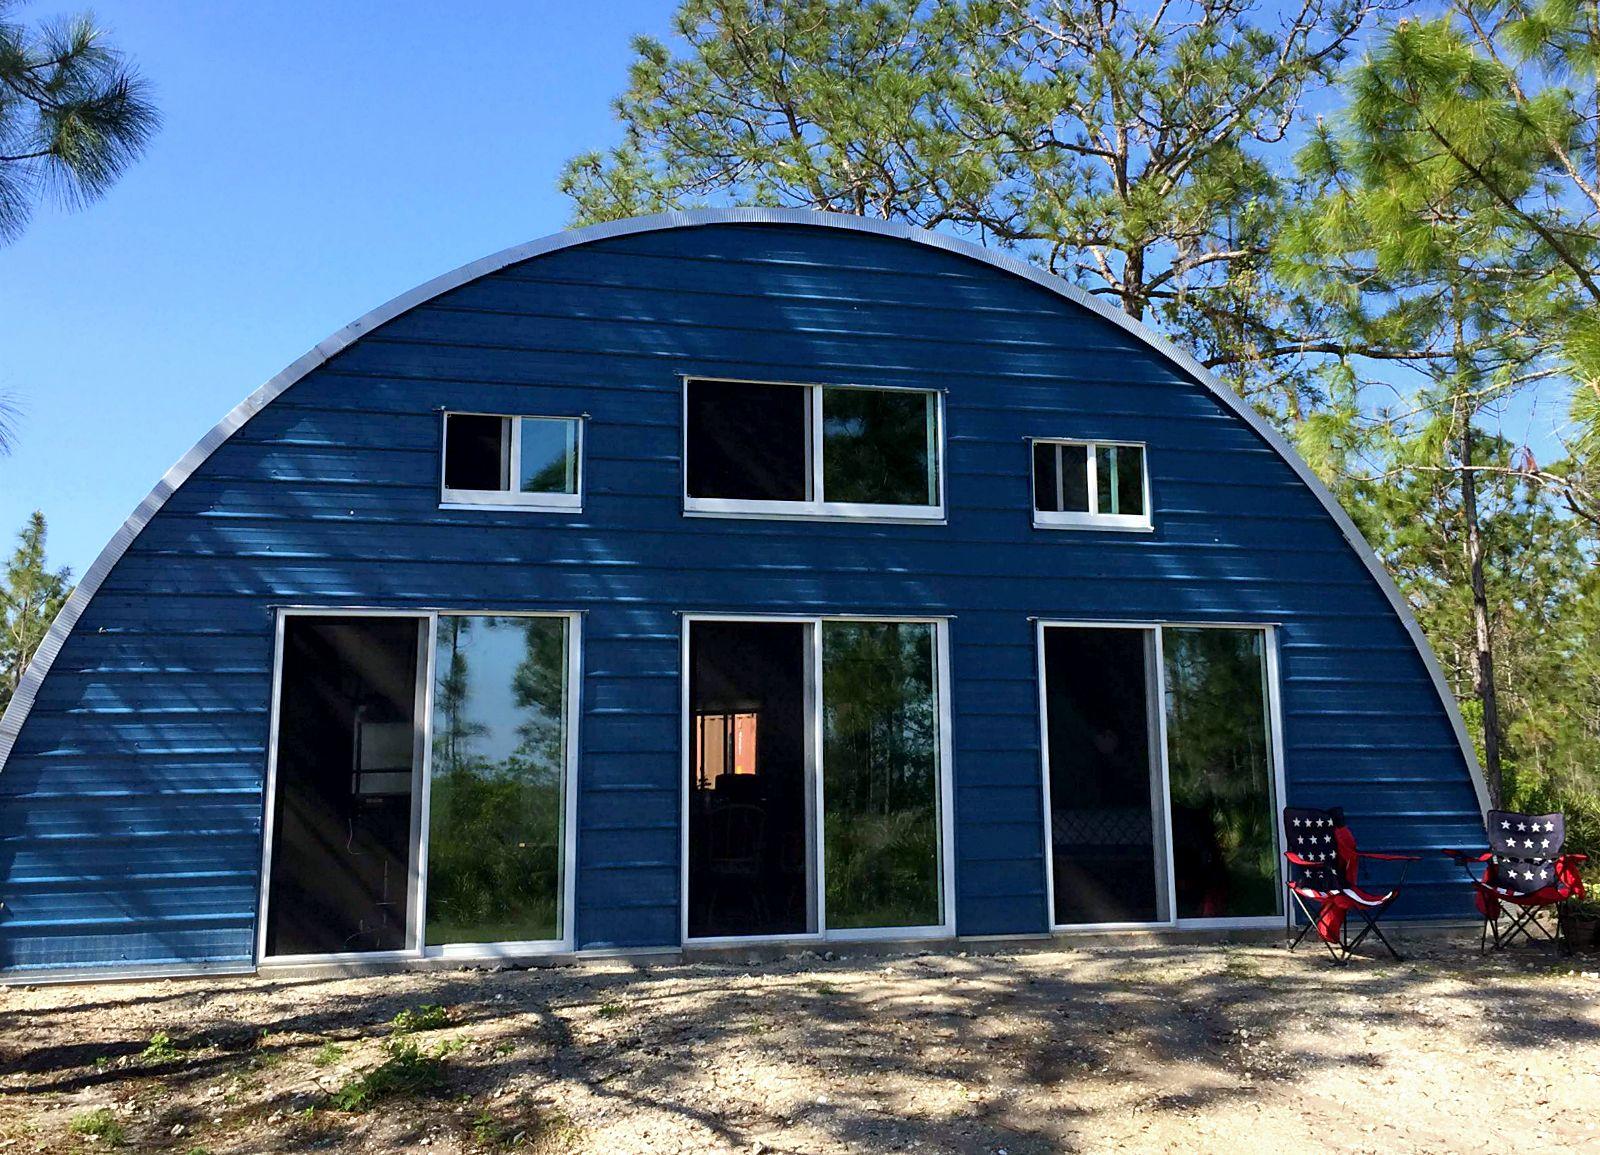 Image result for half round barn houses nz | Beach shack | Pinterest | Barn,  Beach shack and House